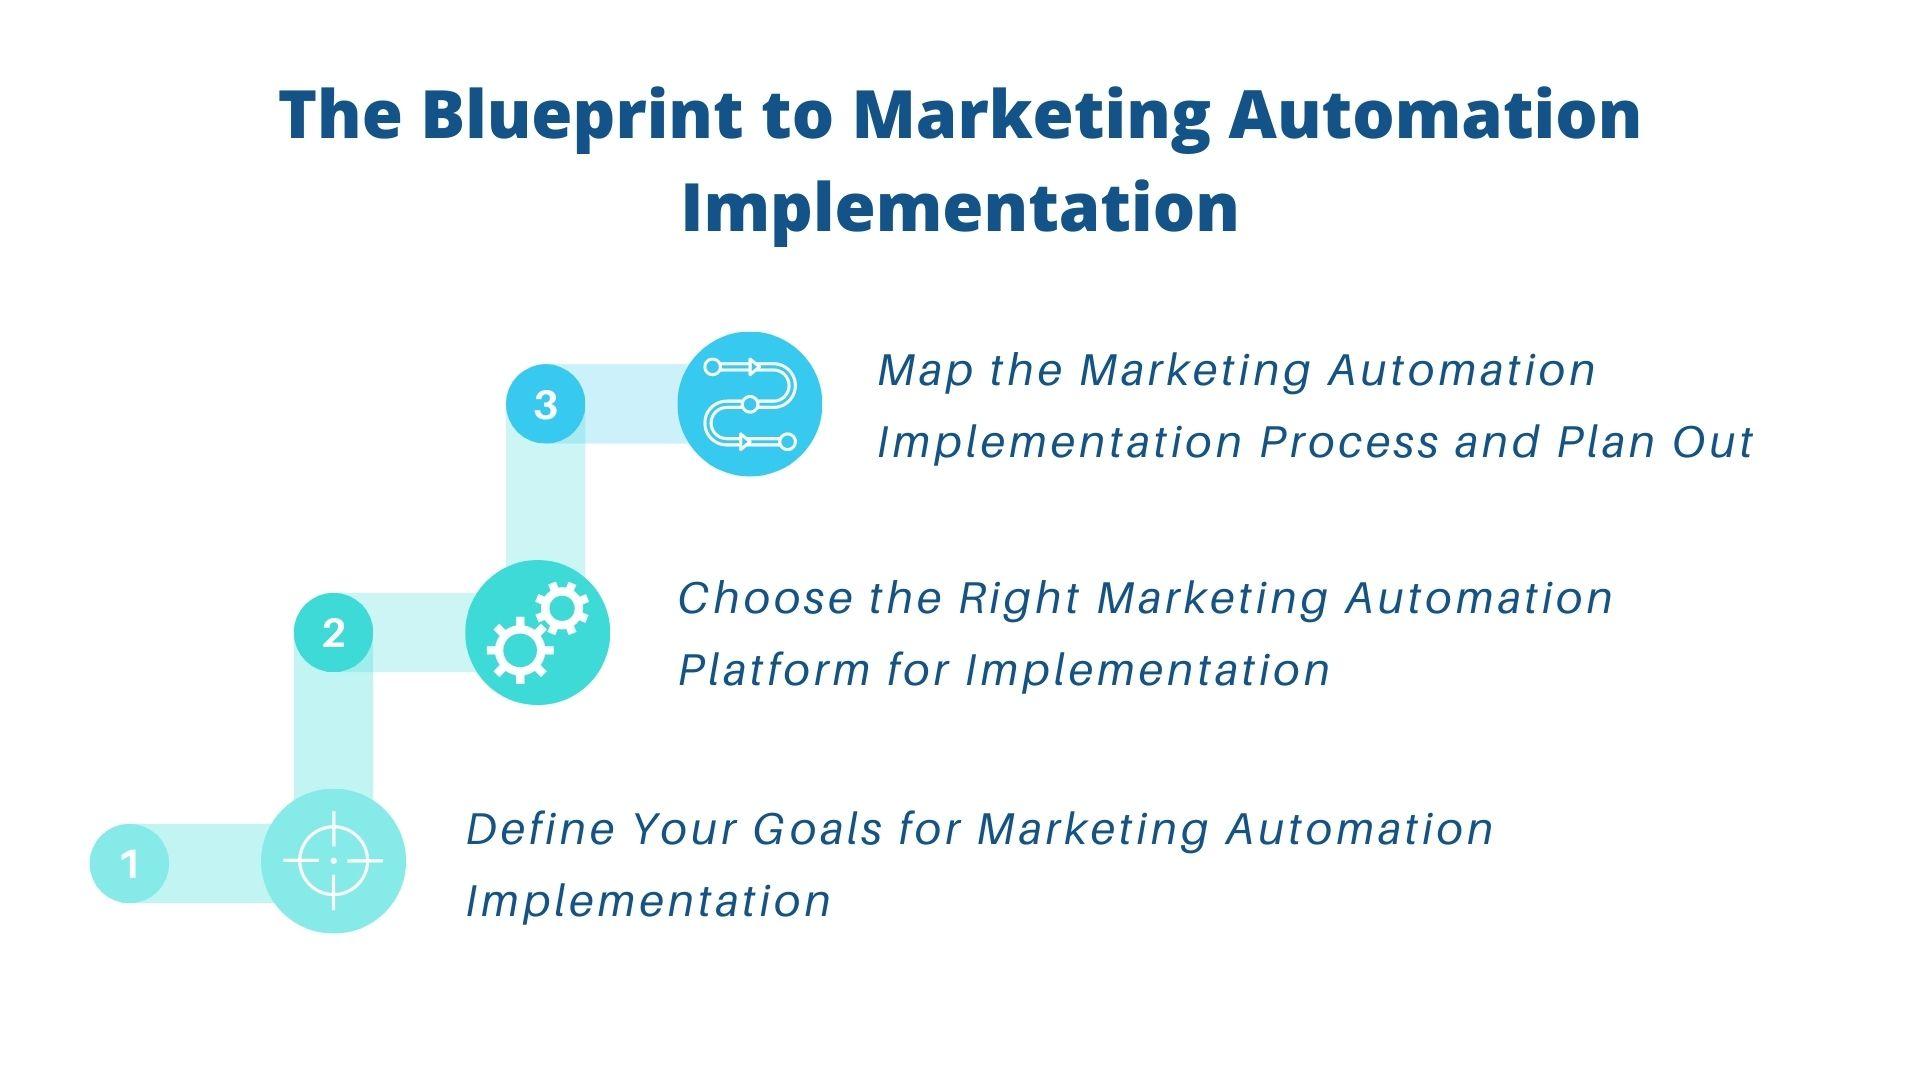 Marketing Automation Implementation Blueprint